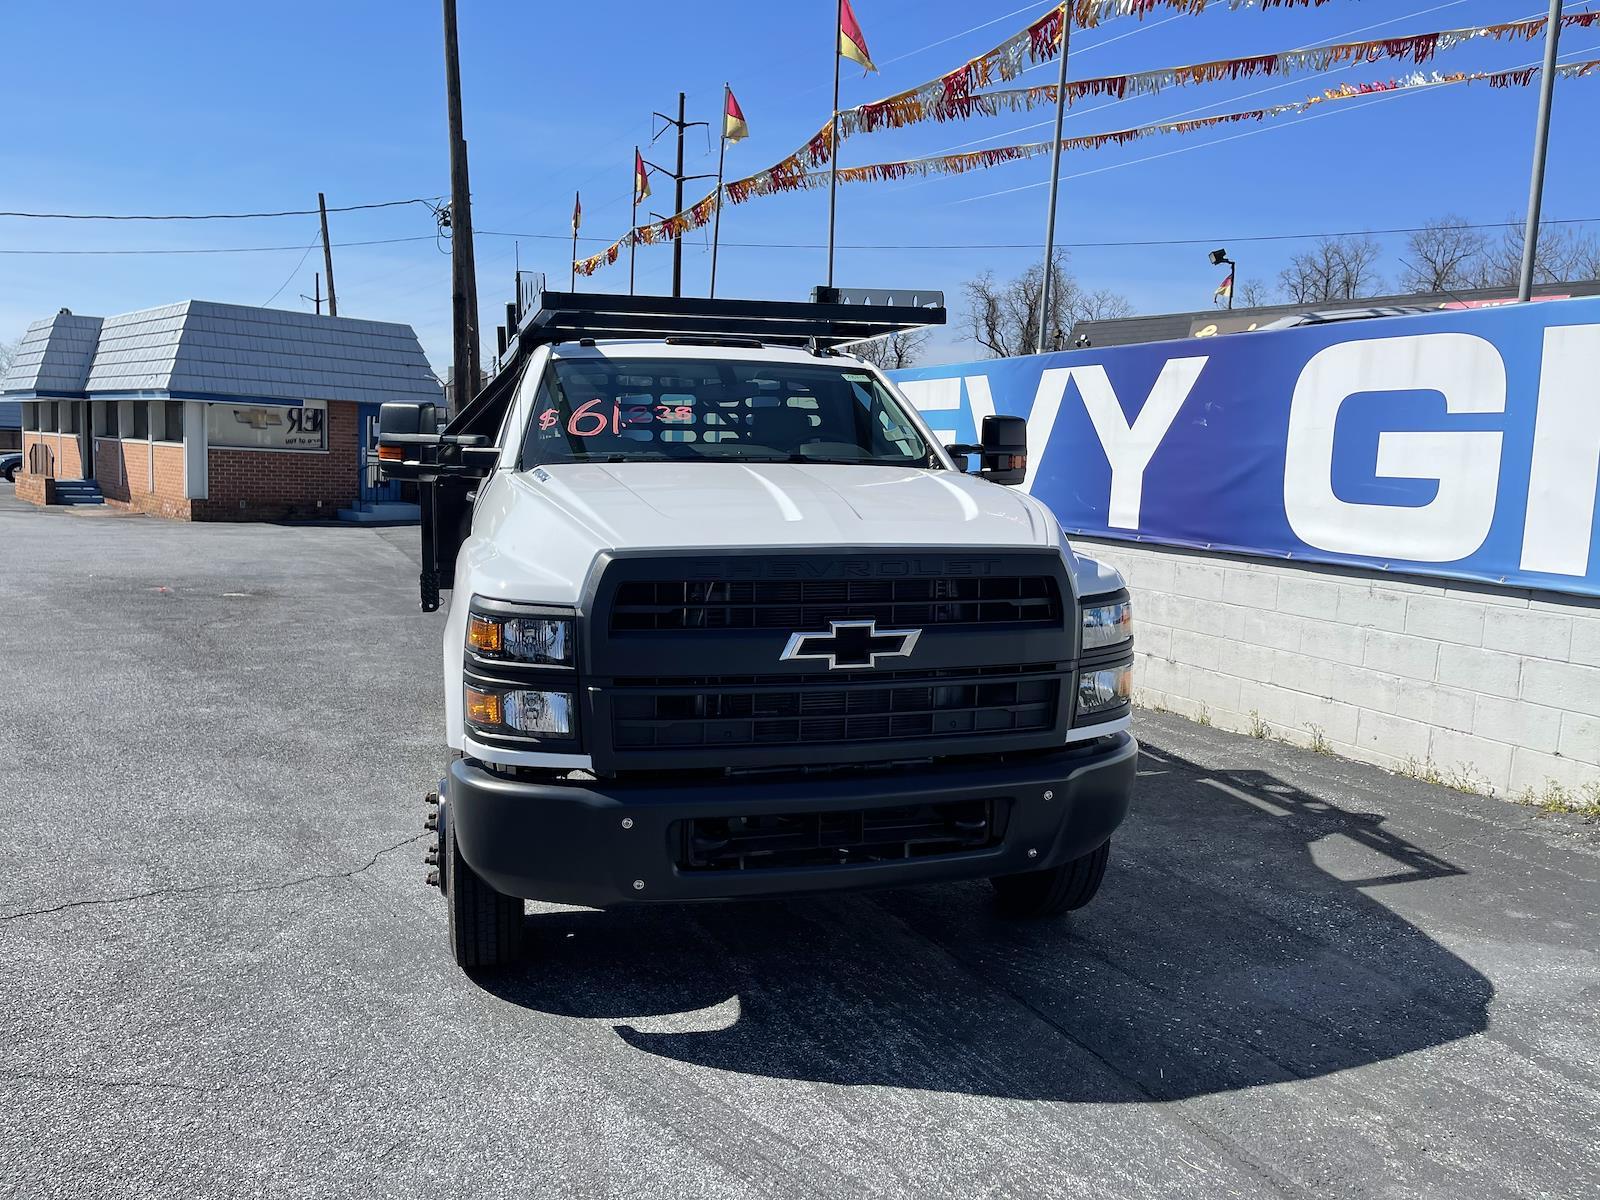 2020 Chevrolet Silverado 4500 Regular Cab DRW 4x2, Mike's Truck Service and Sales Inc. Contractor Body #205978 - photo 9